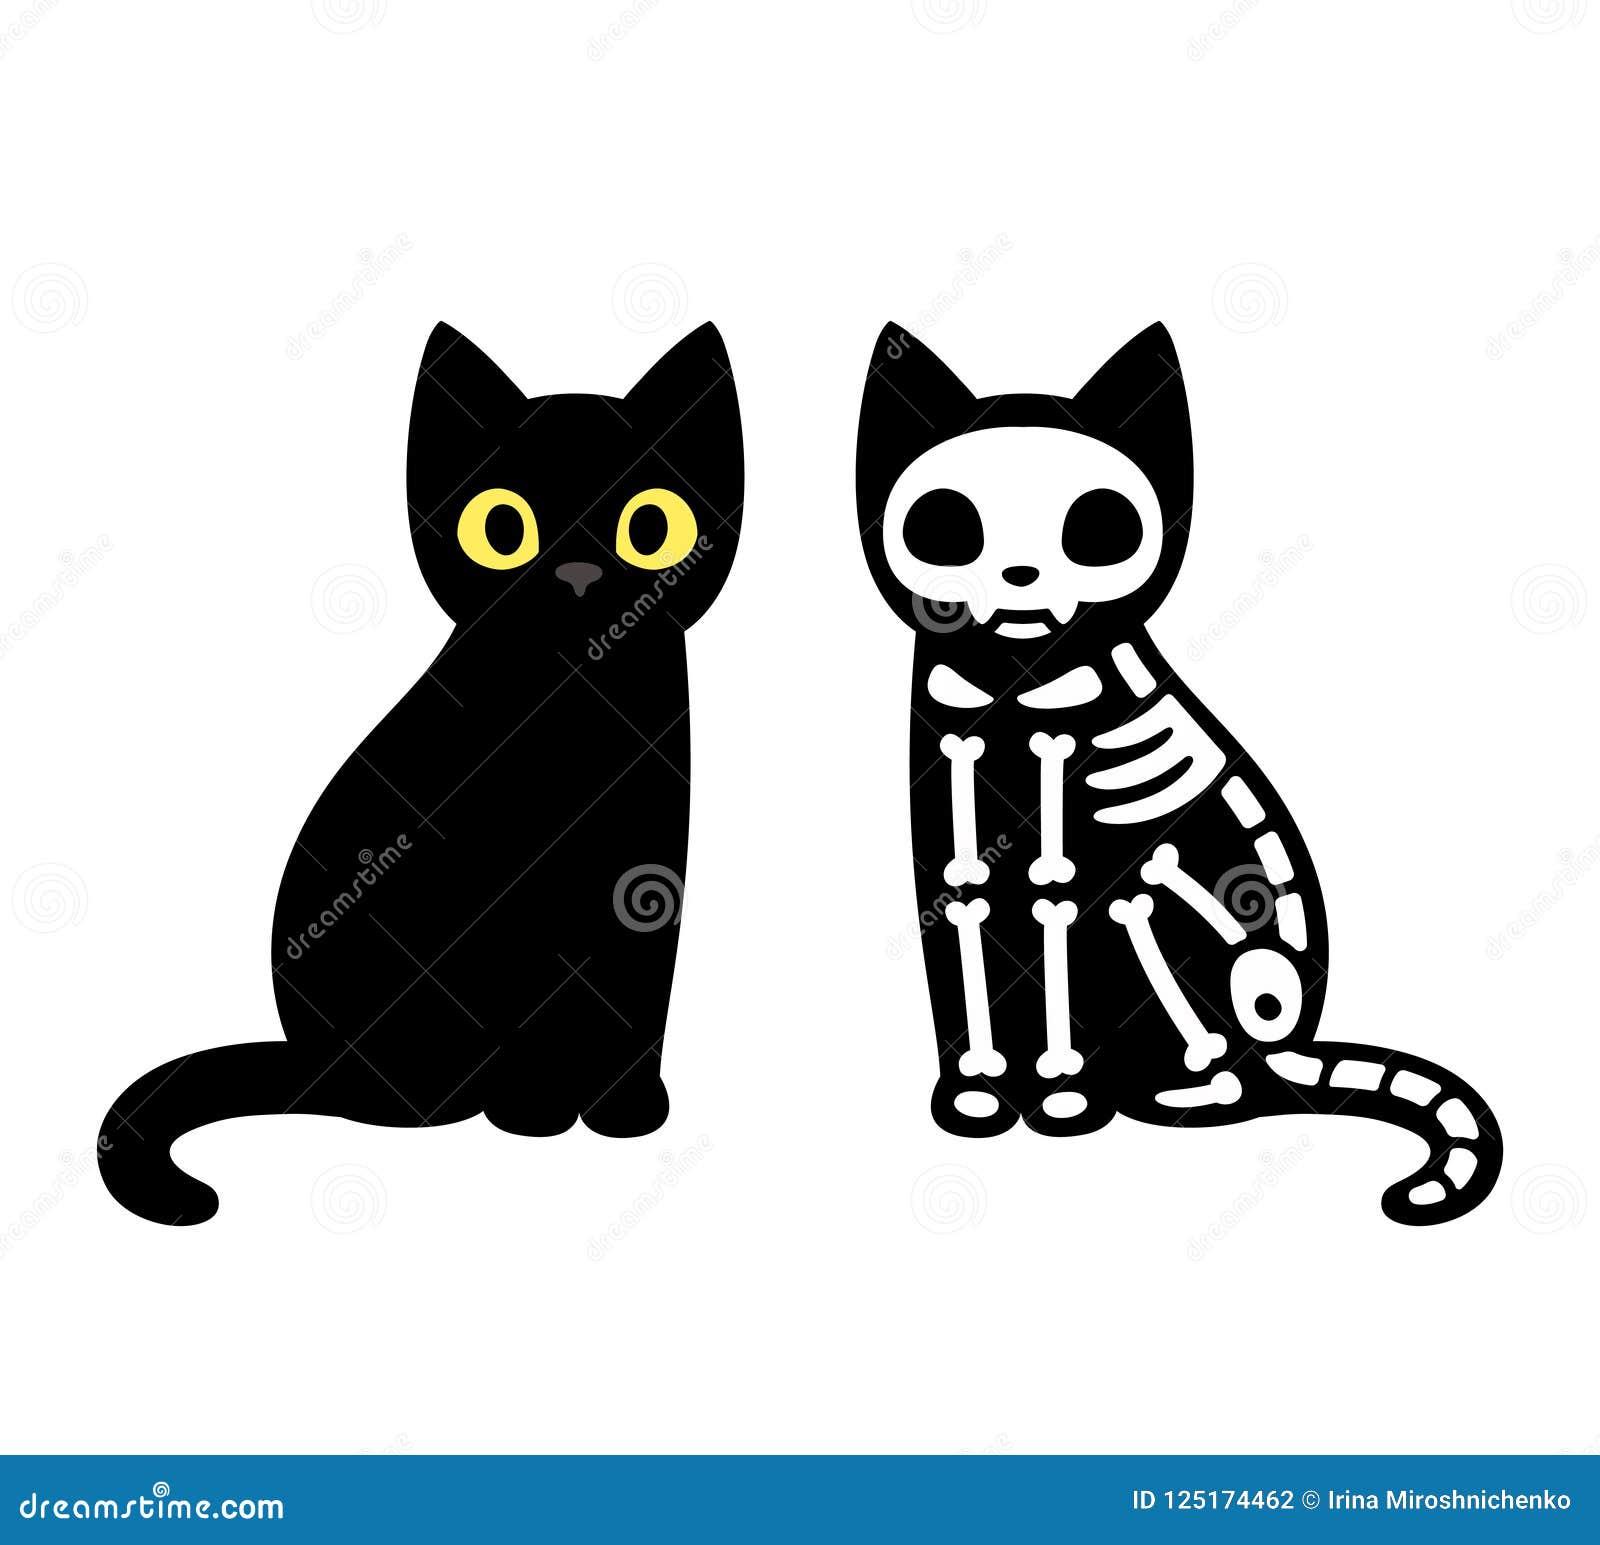 Cartoon black cat drawing with skeleton cute schrodingers cat illustration funny halloween clip art design